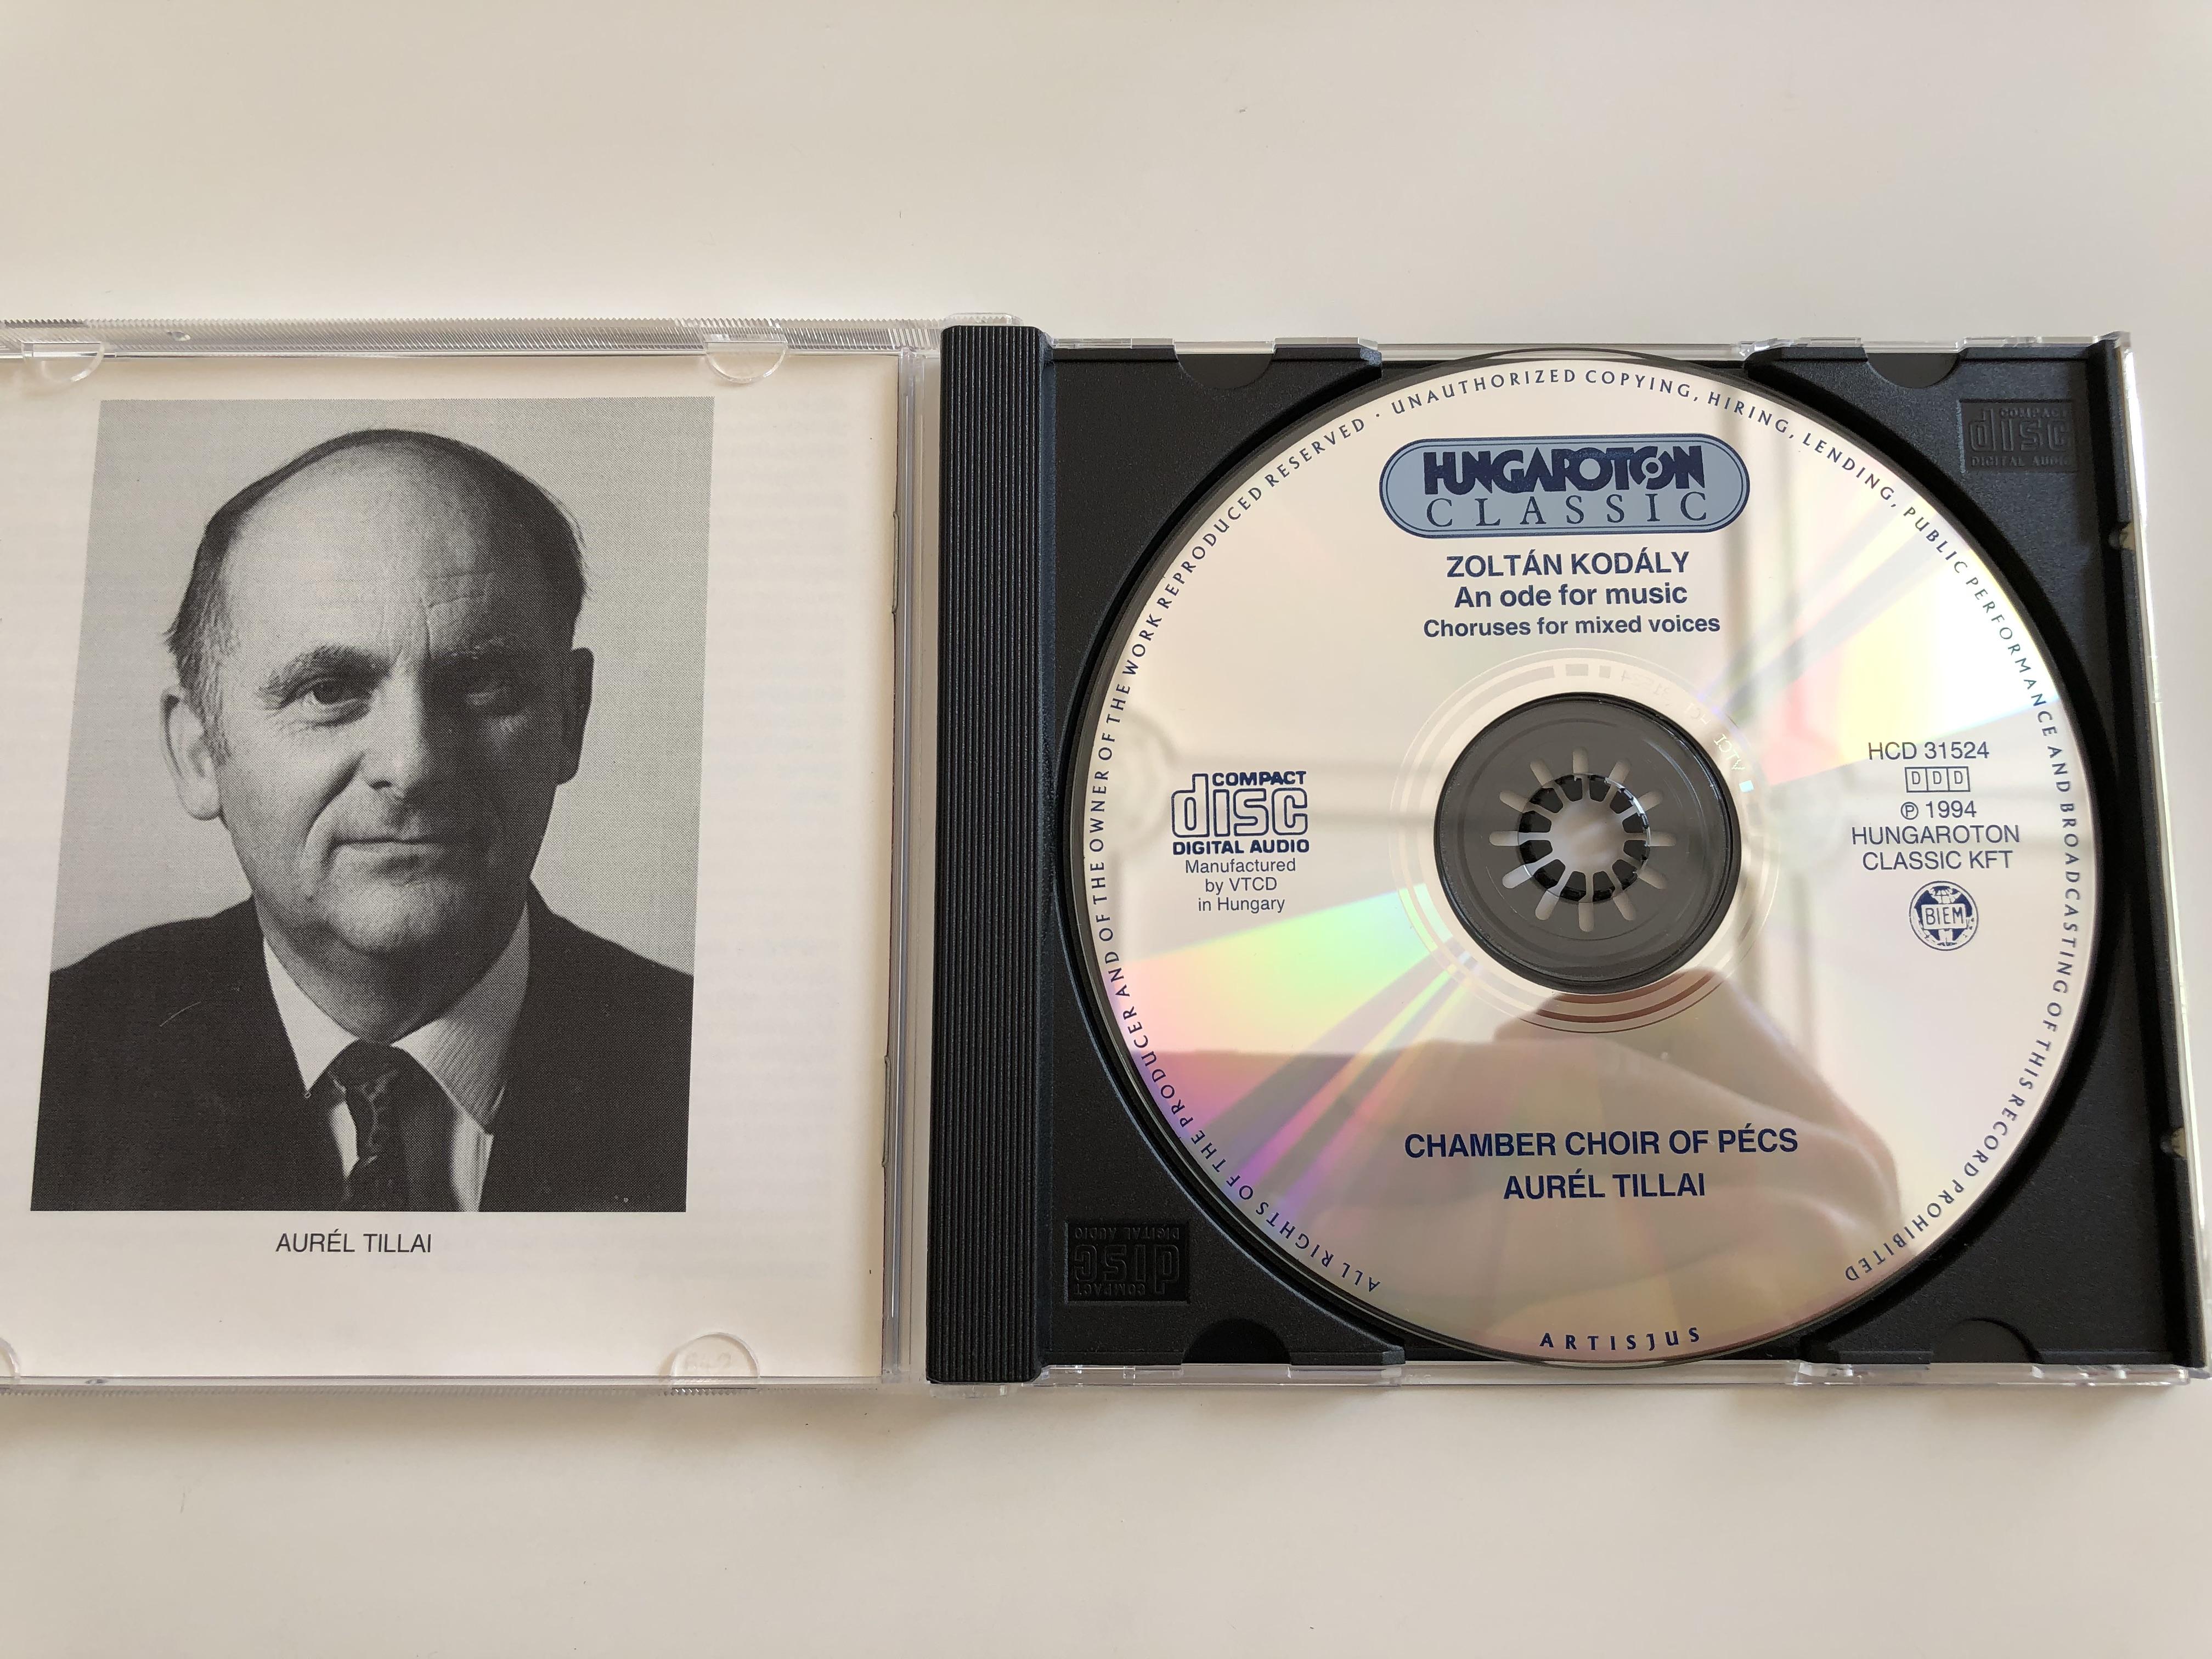 zolt-n-kod-ly-an-ode-for-music-choruses-for-mixed-voices-chamber-choir-of-p-cs-aur-l-tillai-hungaroton-classic-audio-cd-1994-hcd-31524-5-.jpg